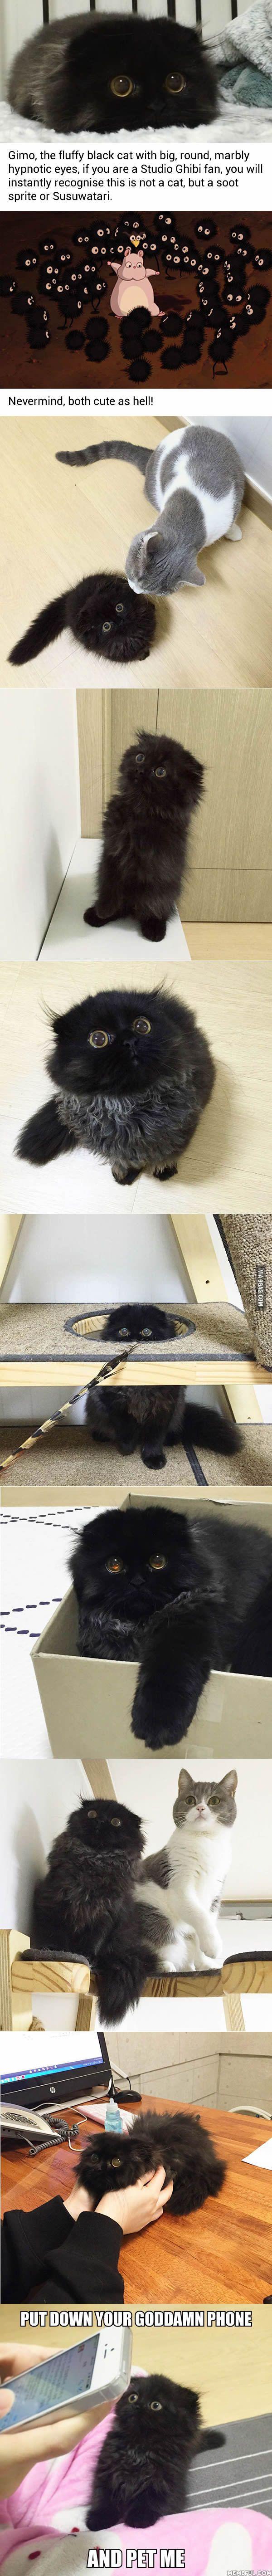 This Giant-Eyed Cat Looks Like Studio Ghibli's Soot Sprite - Disregard bad language last frame!